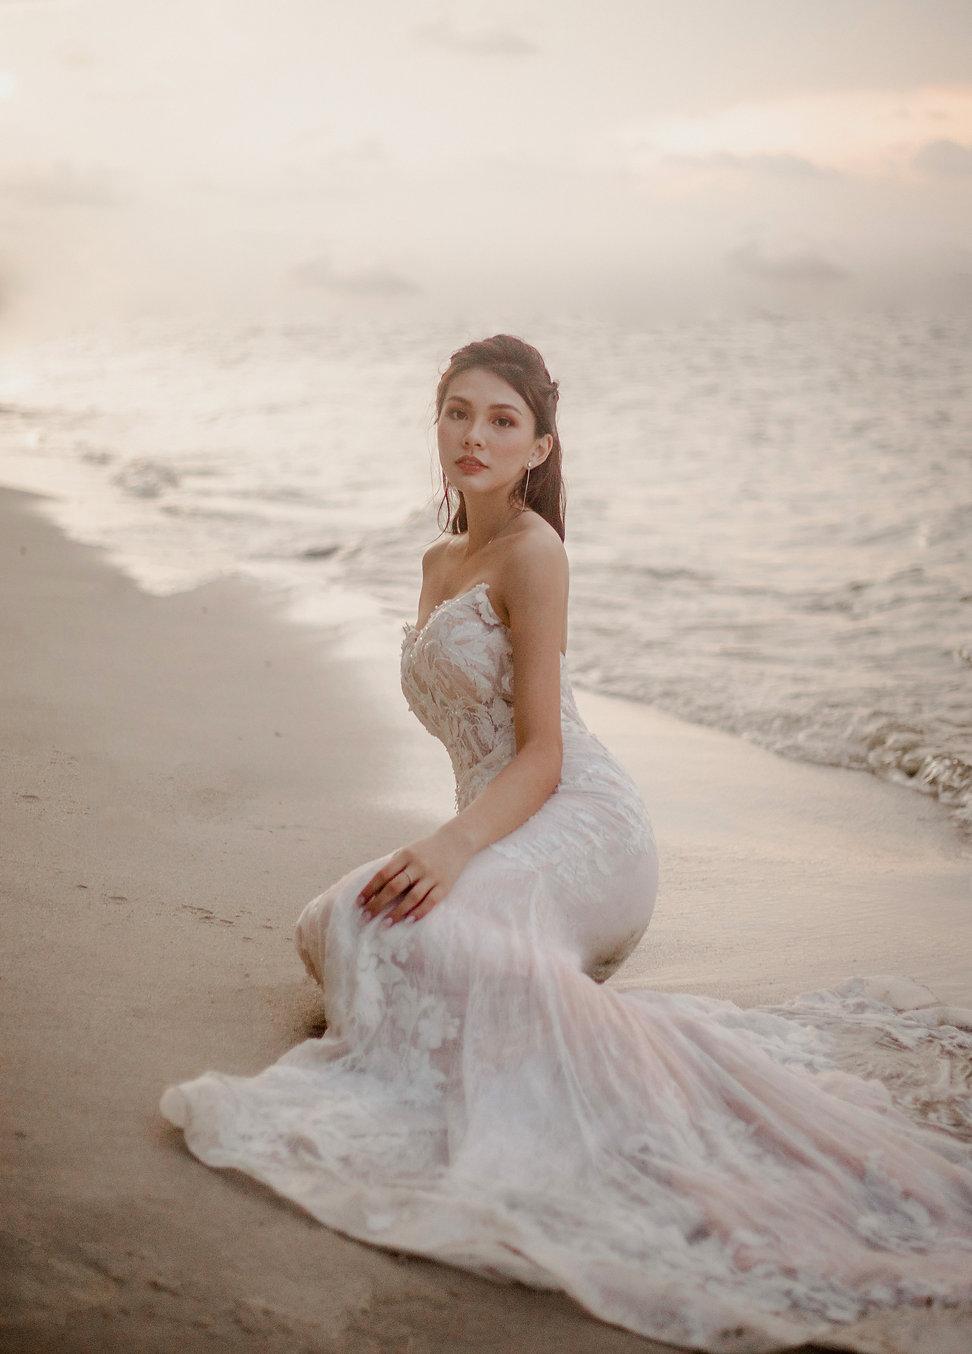 Mermaid sunset beach bridal shoot